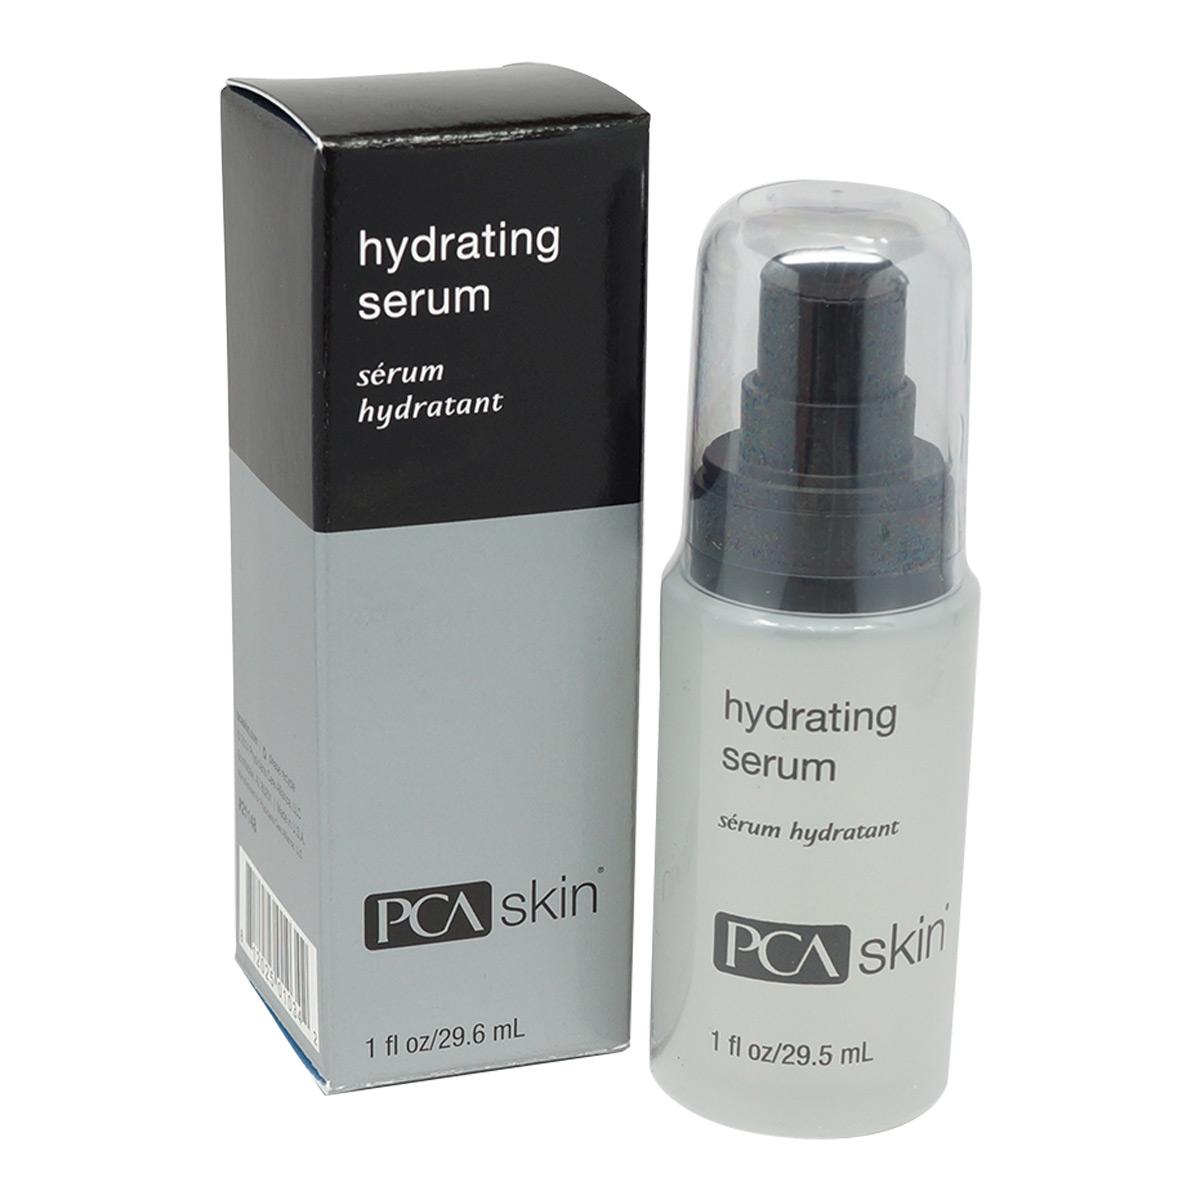 PCA Skin Hydrating Serum, 1 Oz